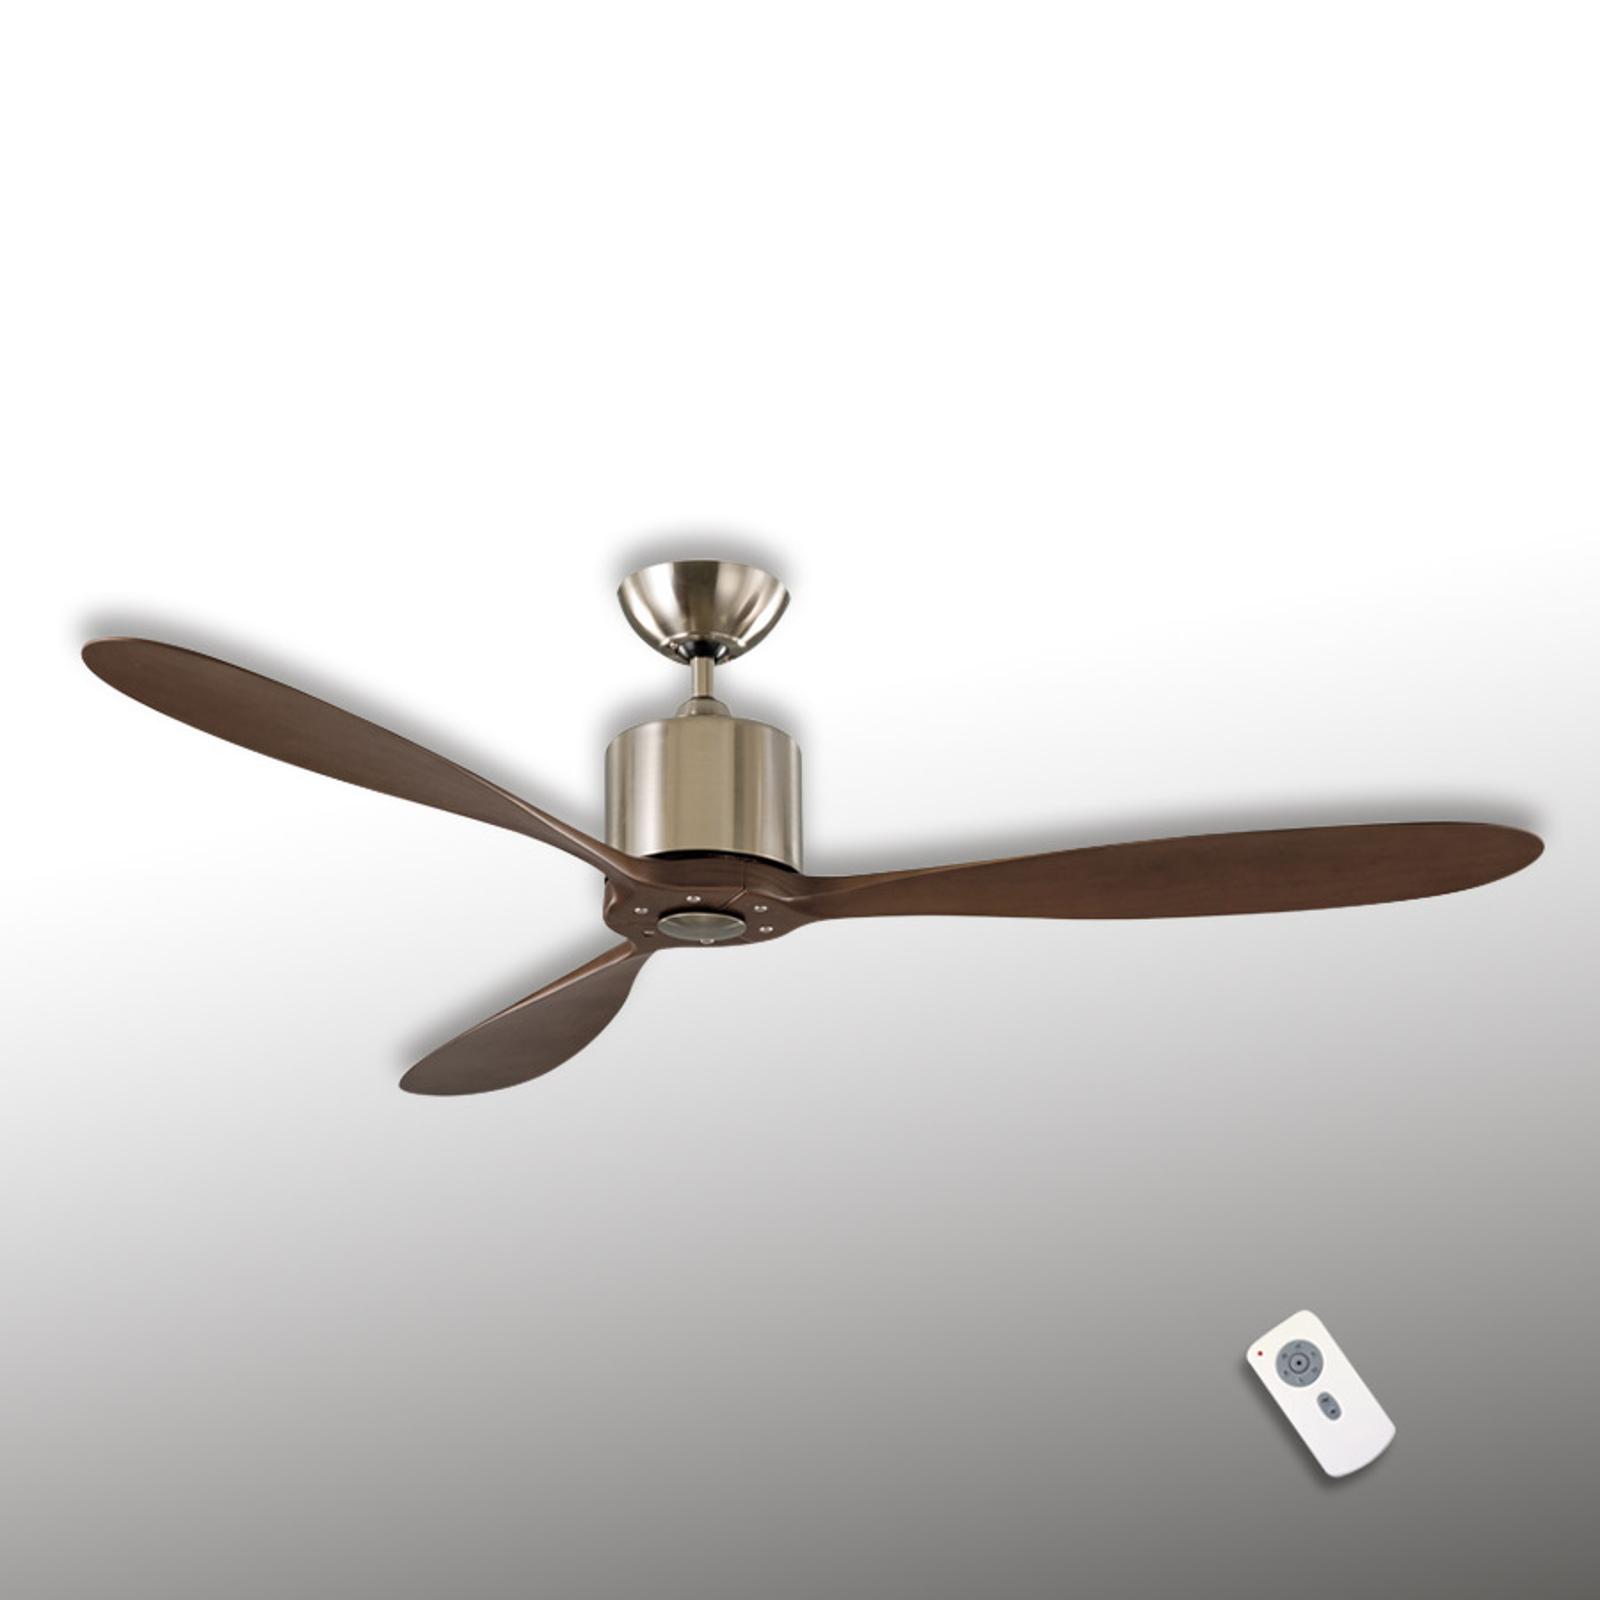 Aeroplan Eco ceiling fan, chrome, walnut_2015068_1